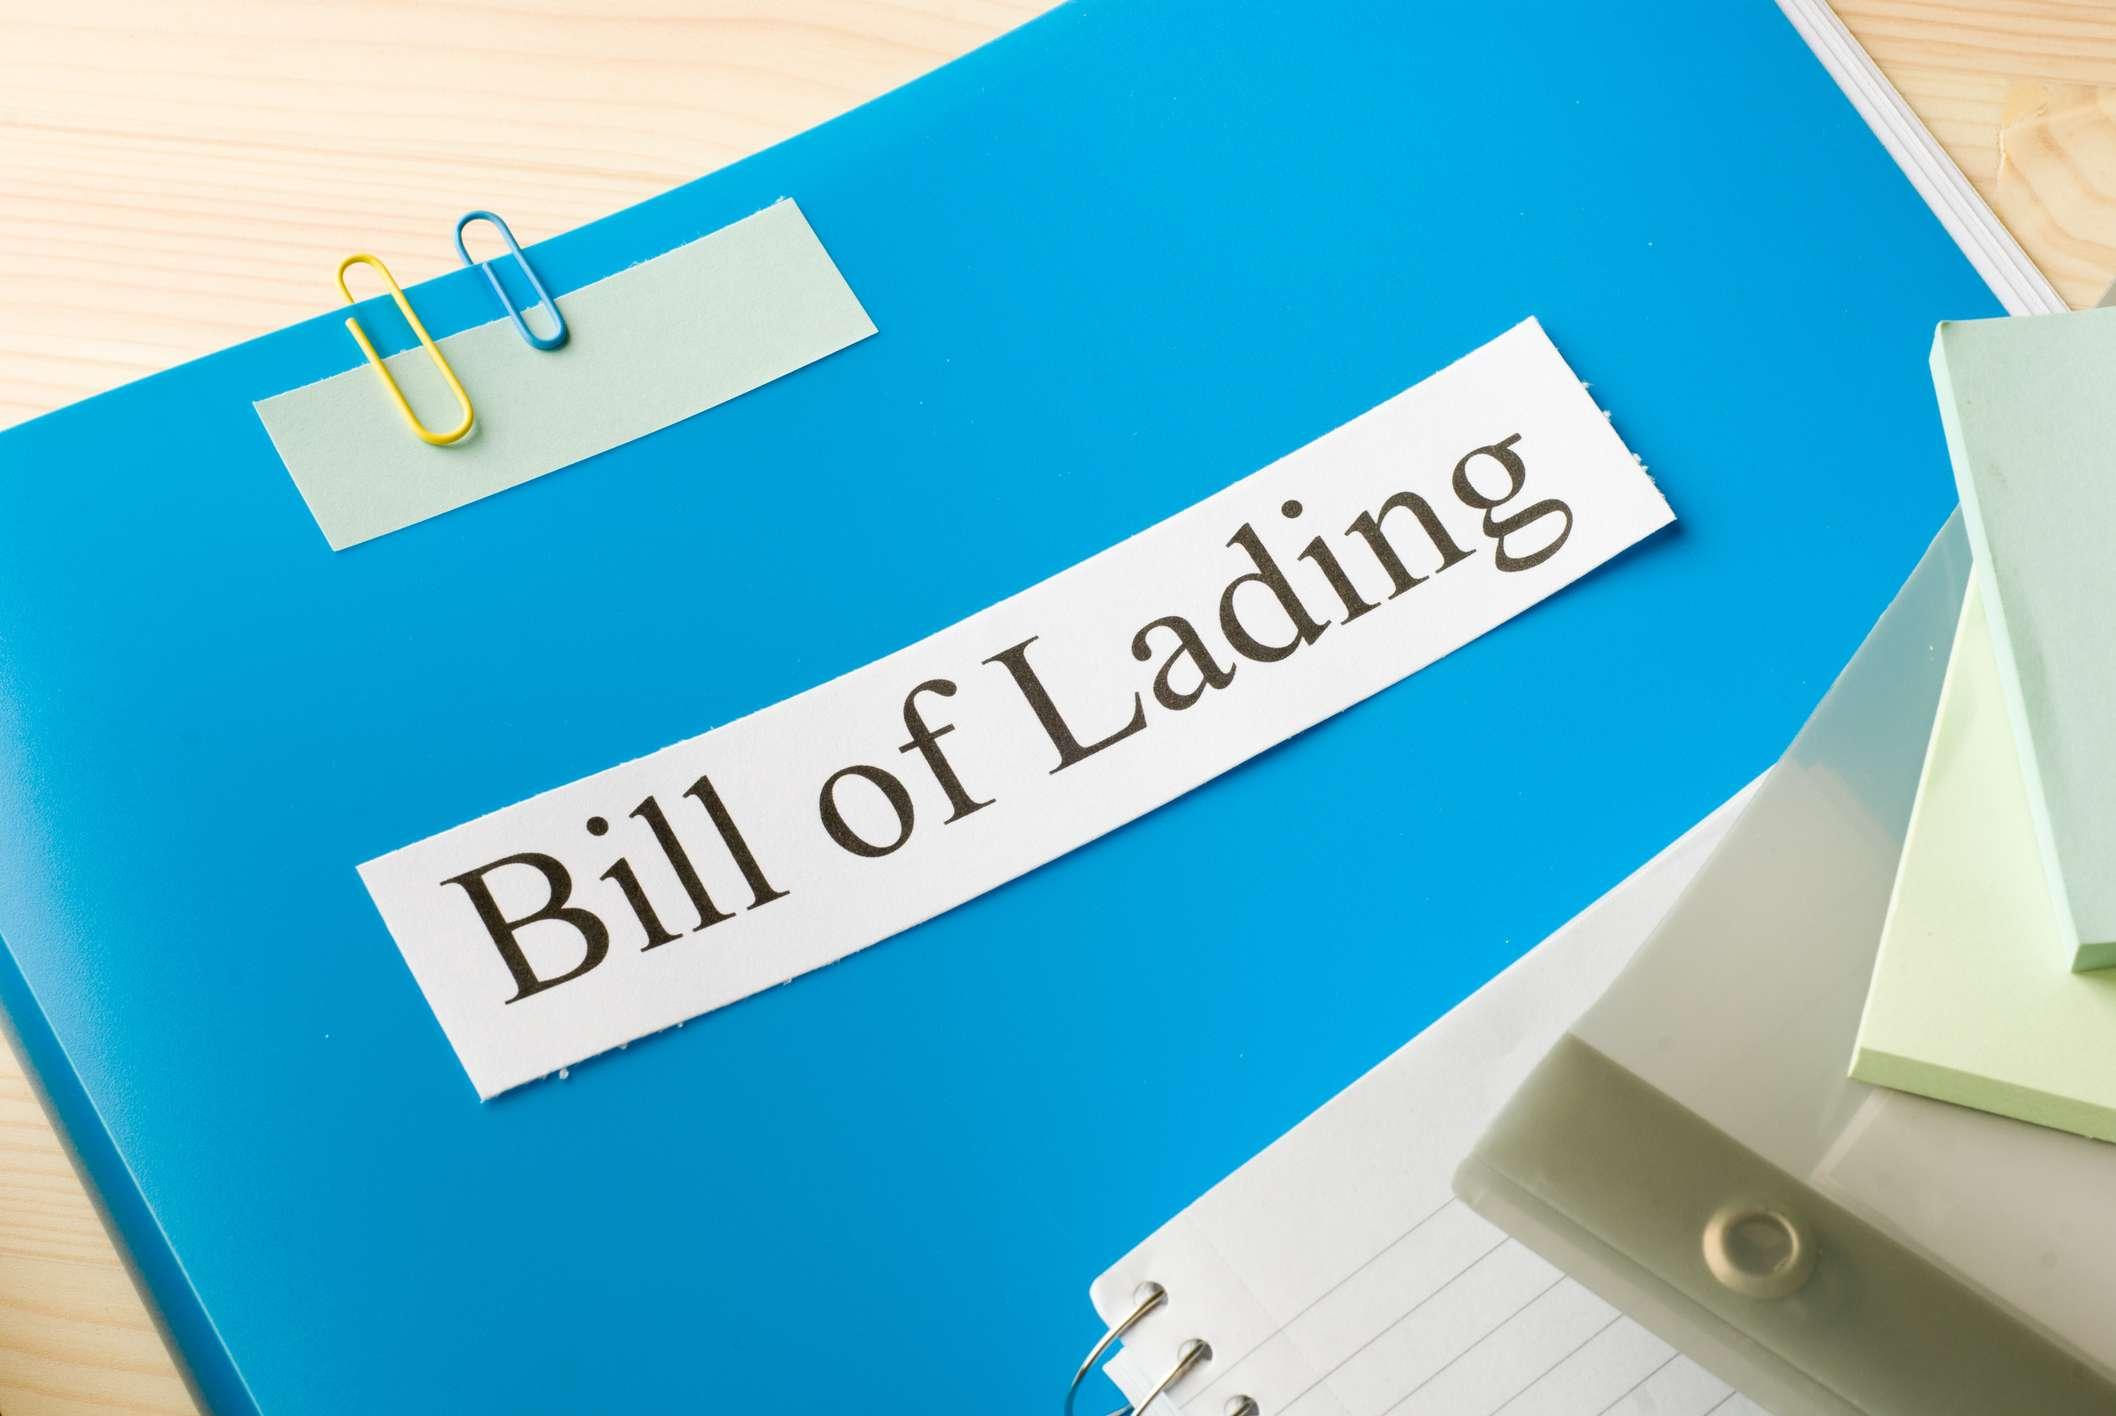 Bill Of Lading Definition